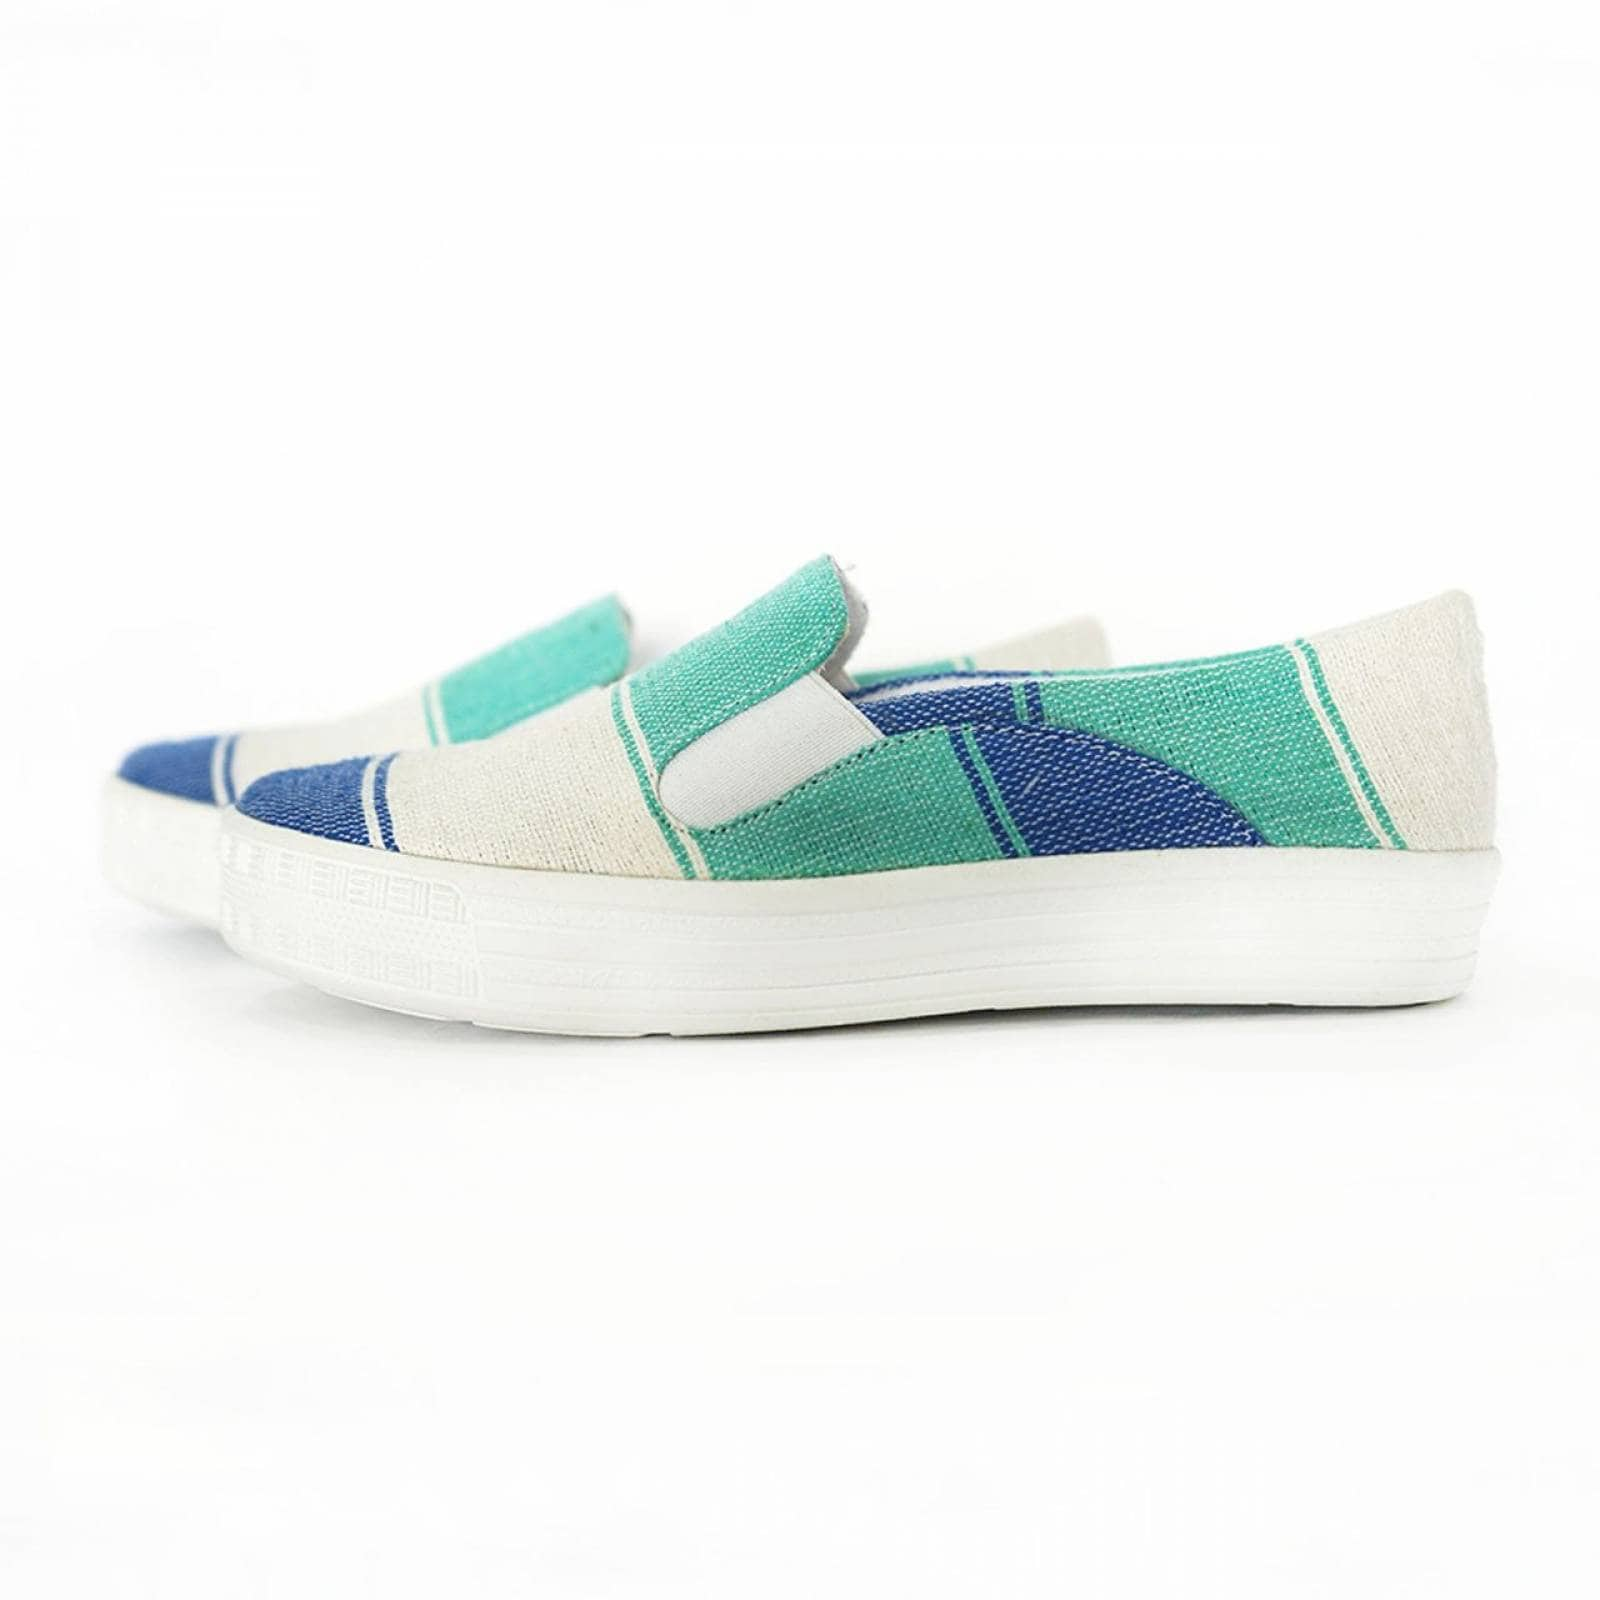 Tenis Zapato Slip On Artesanal Tela Mujer Lola Azul Komoni Talla: 26